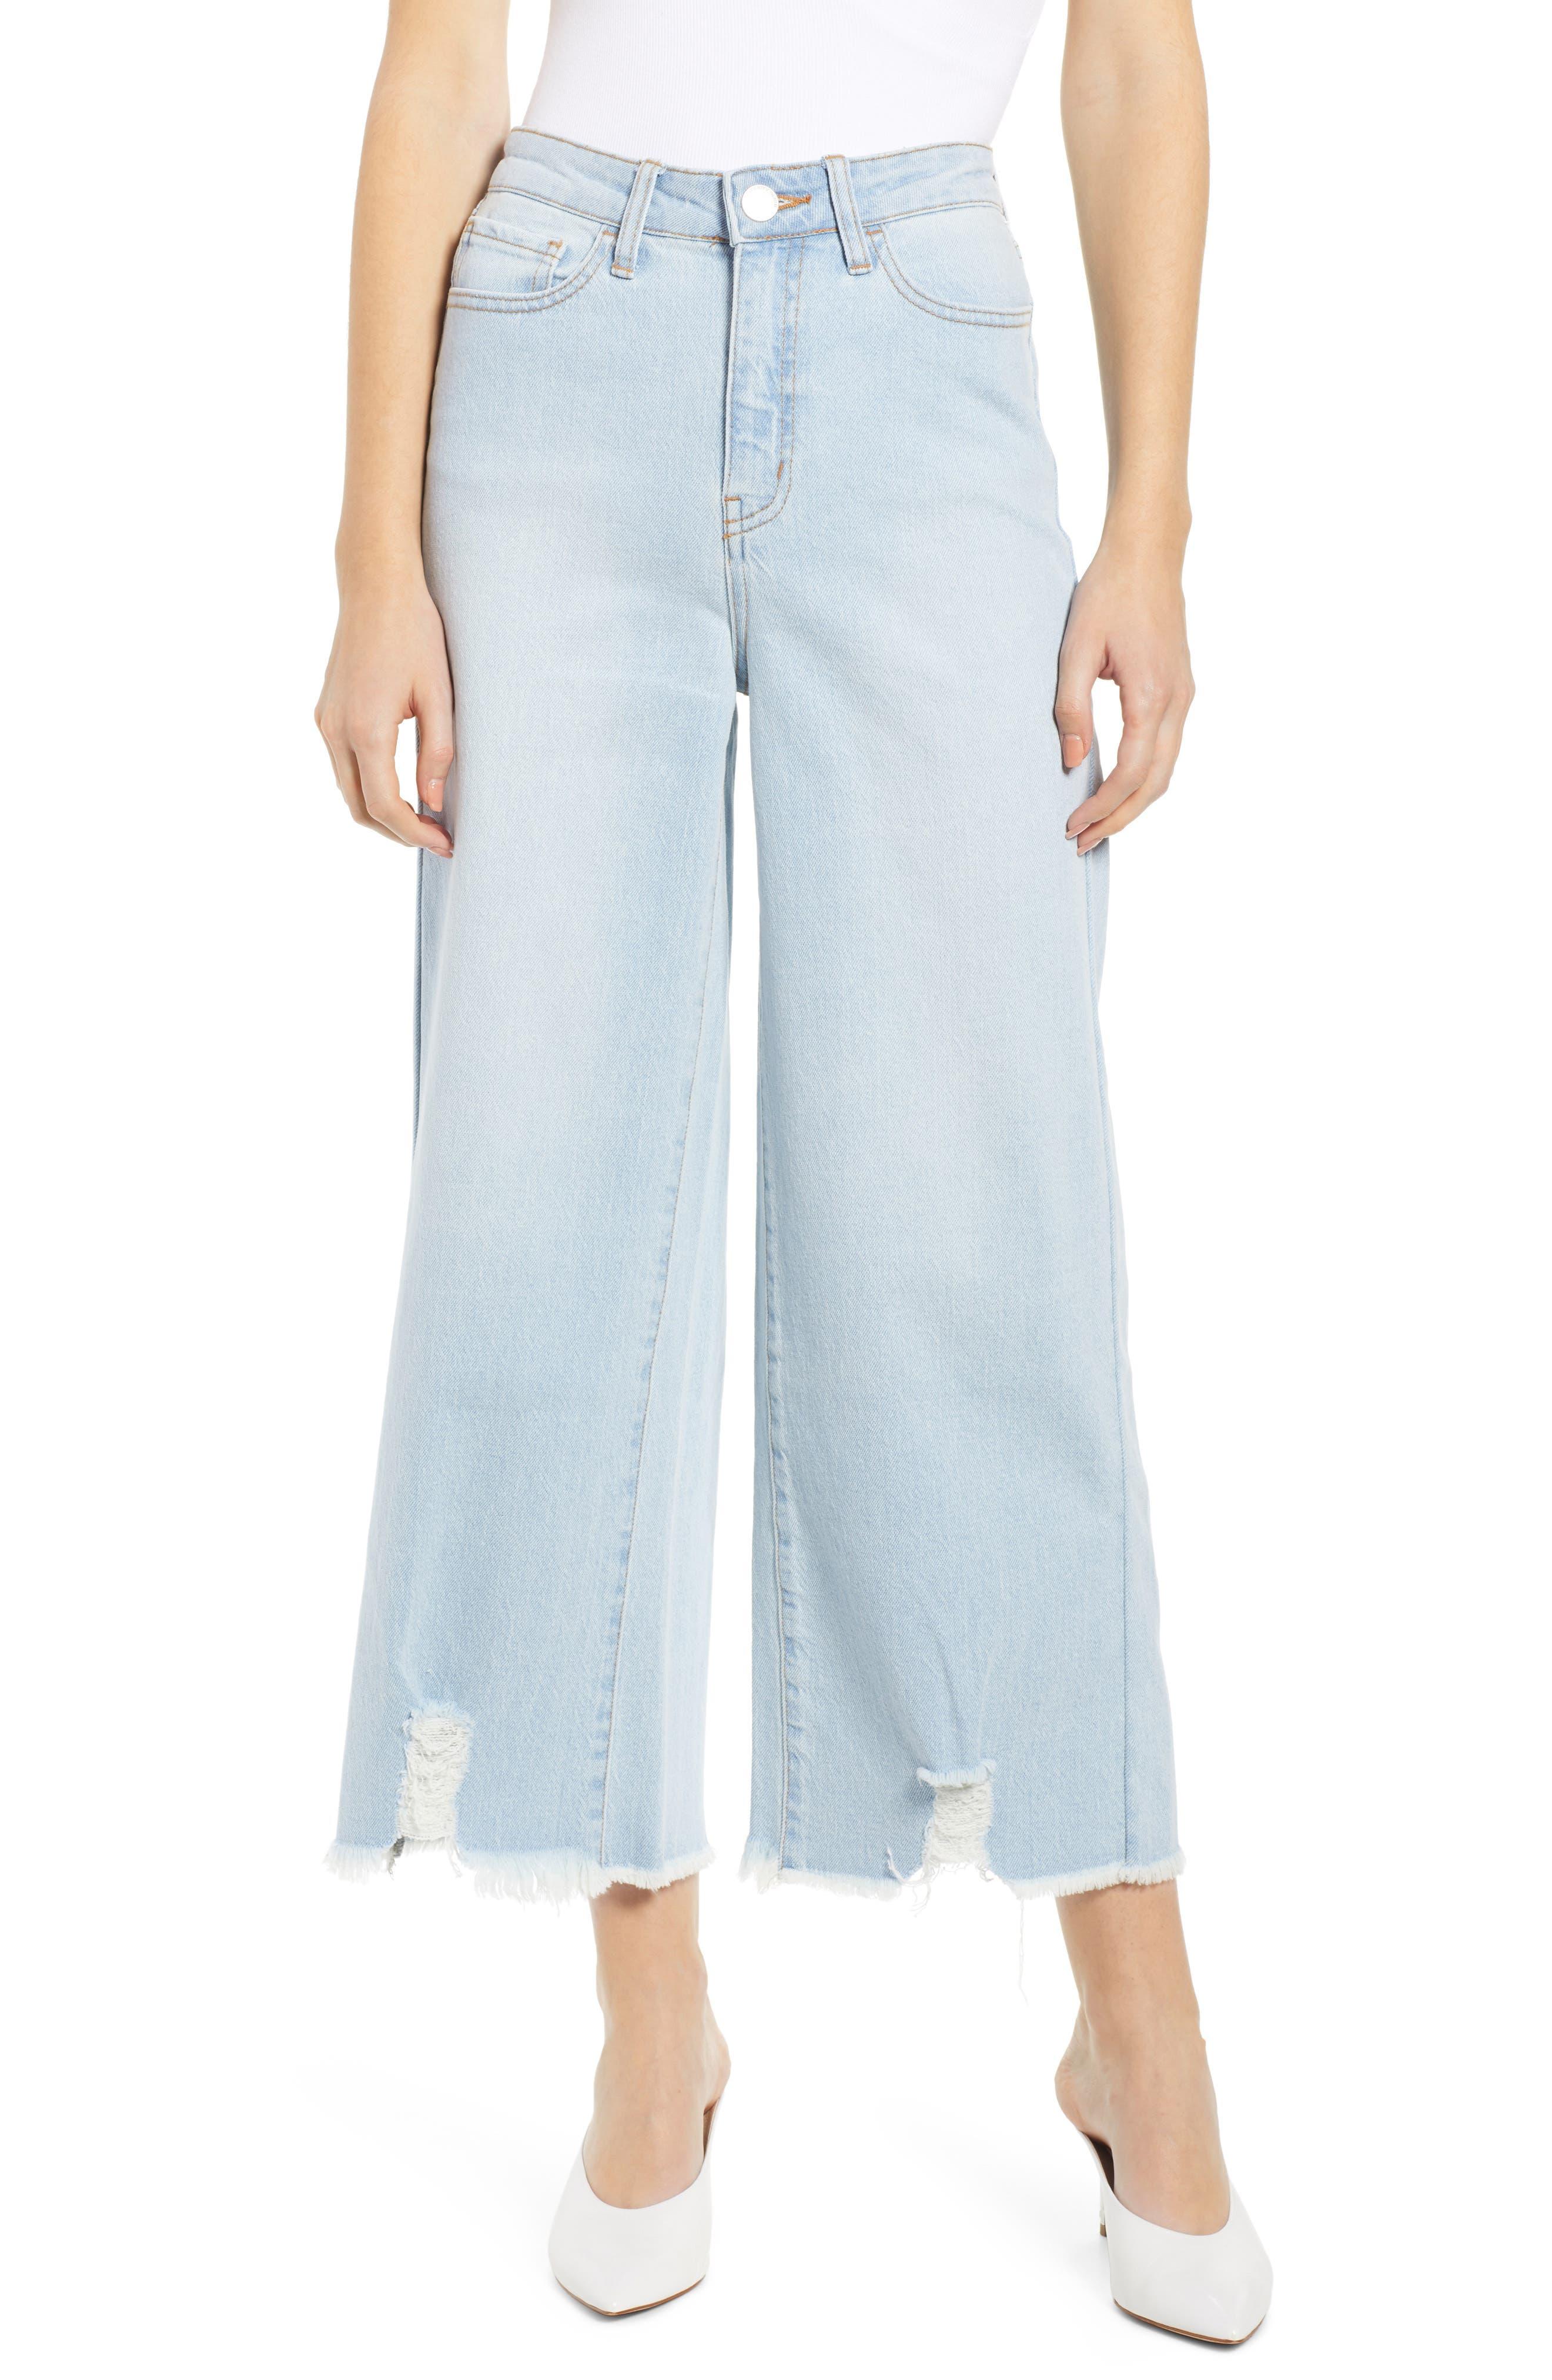 PROSPERITY DENIM Fray Hem Wide Leg Crop Jeans, Main, color, LIGHT WASH